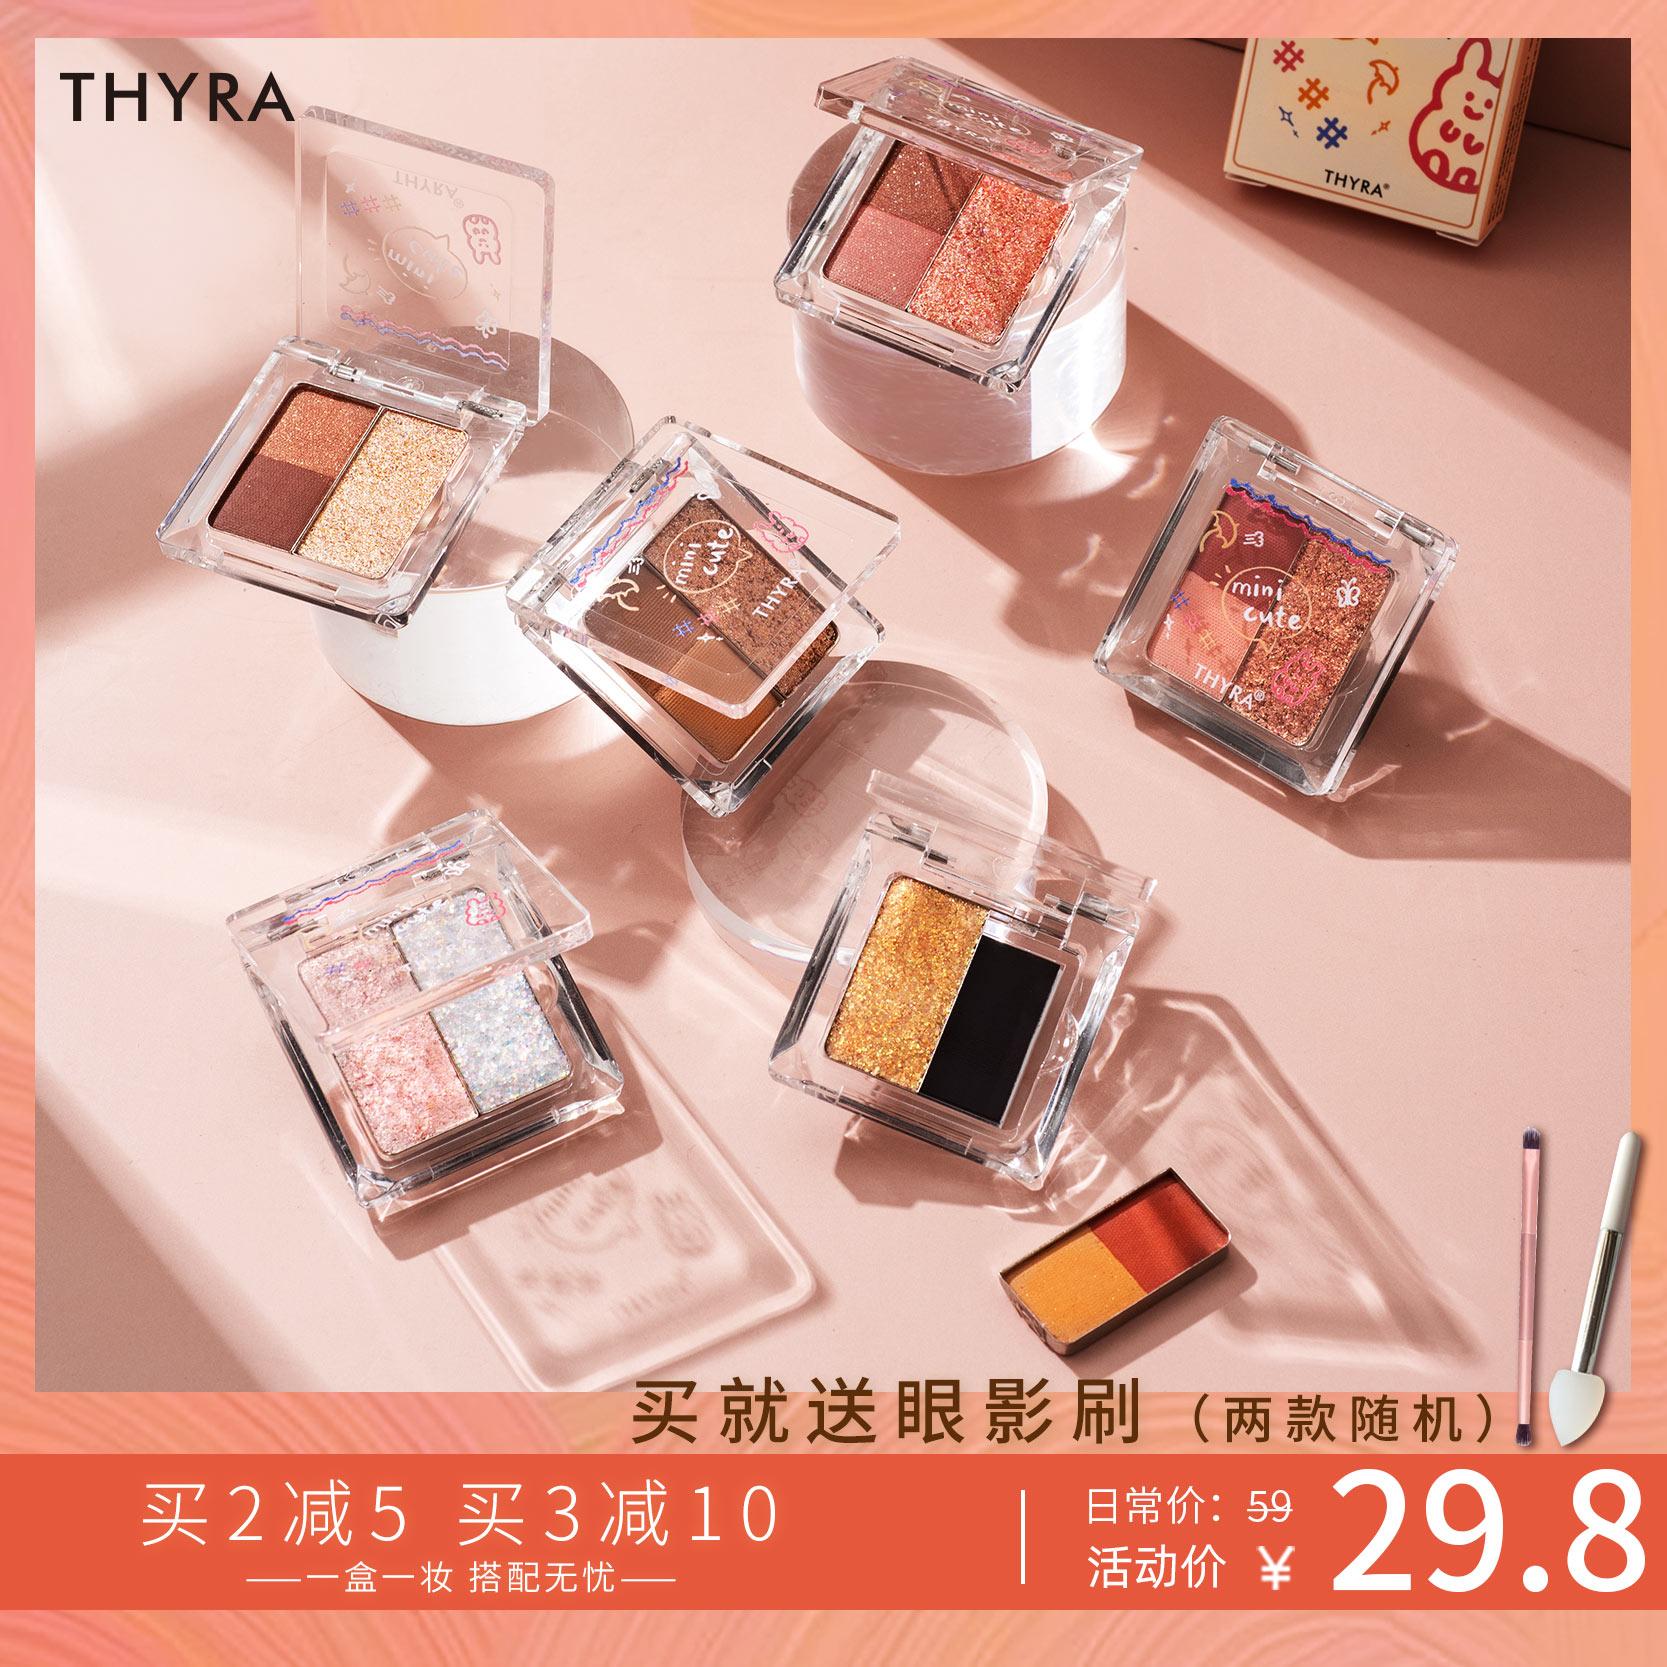 thyra /昙雅三色小萌新系列眼影质量怎么样